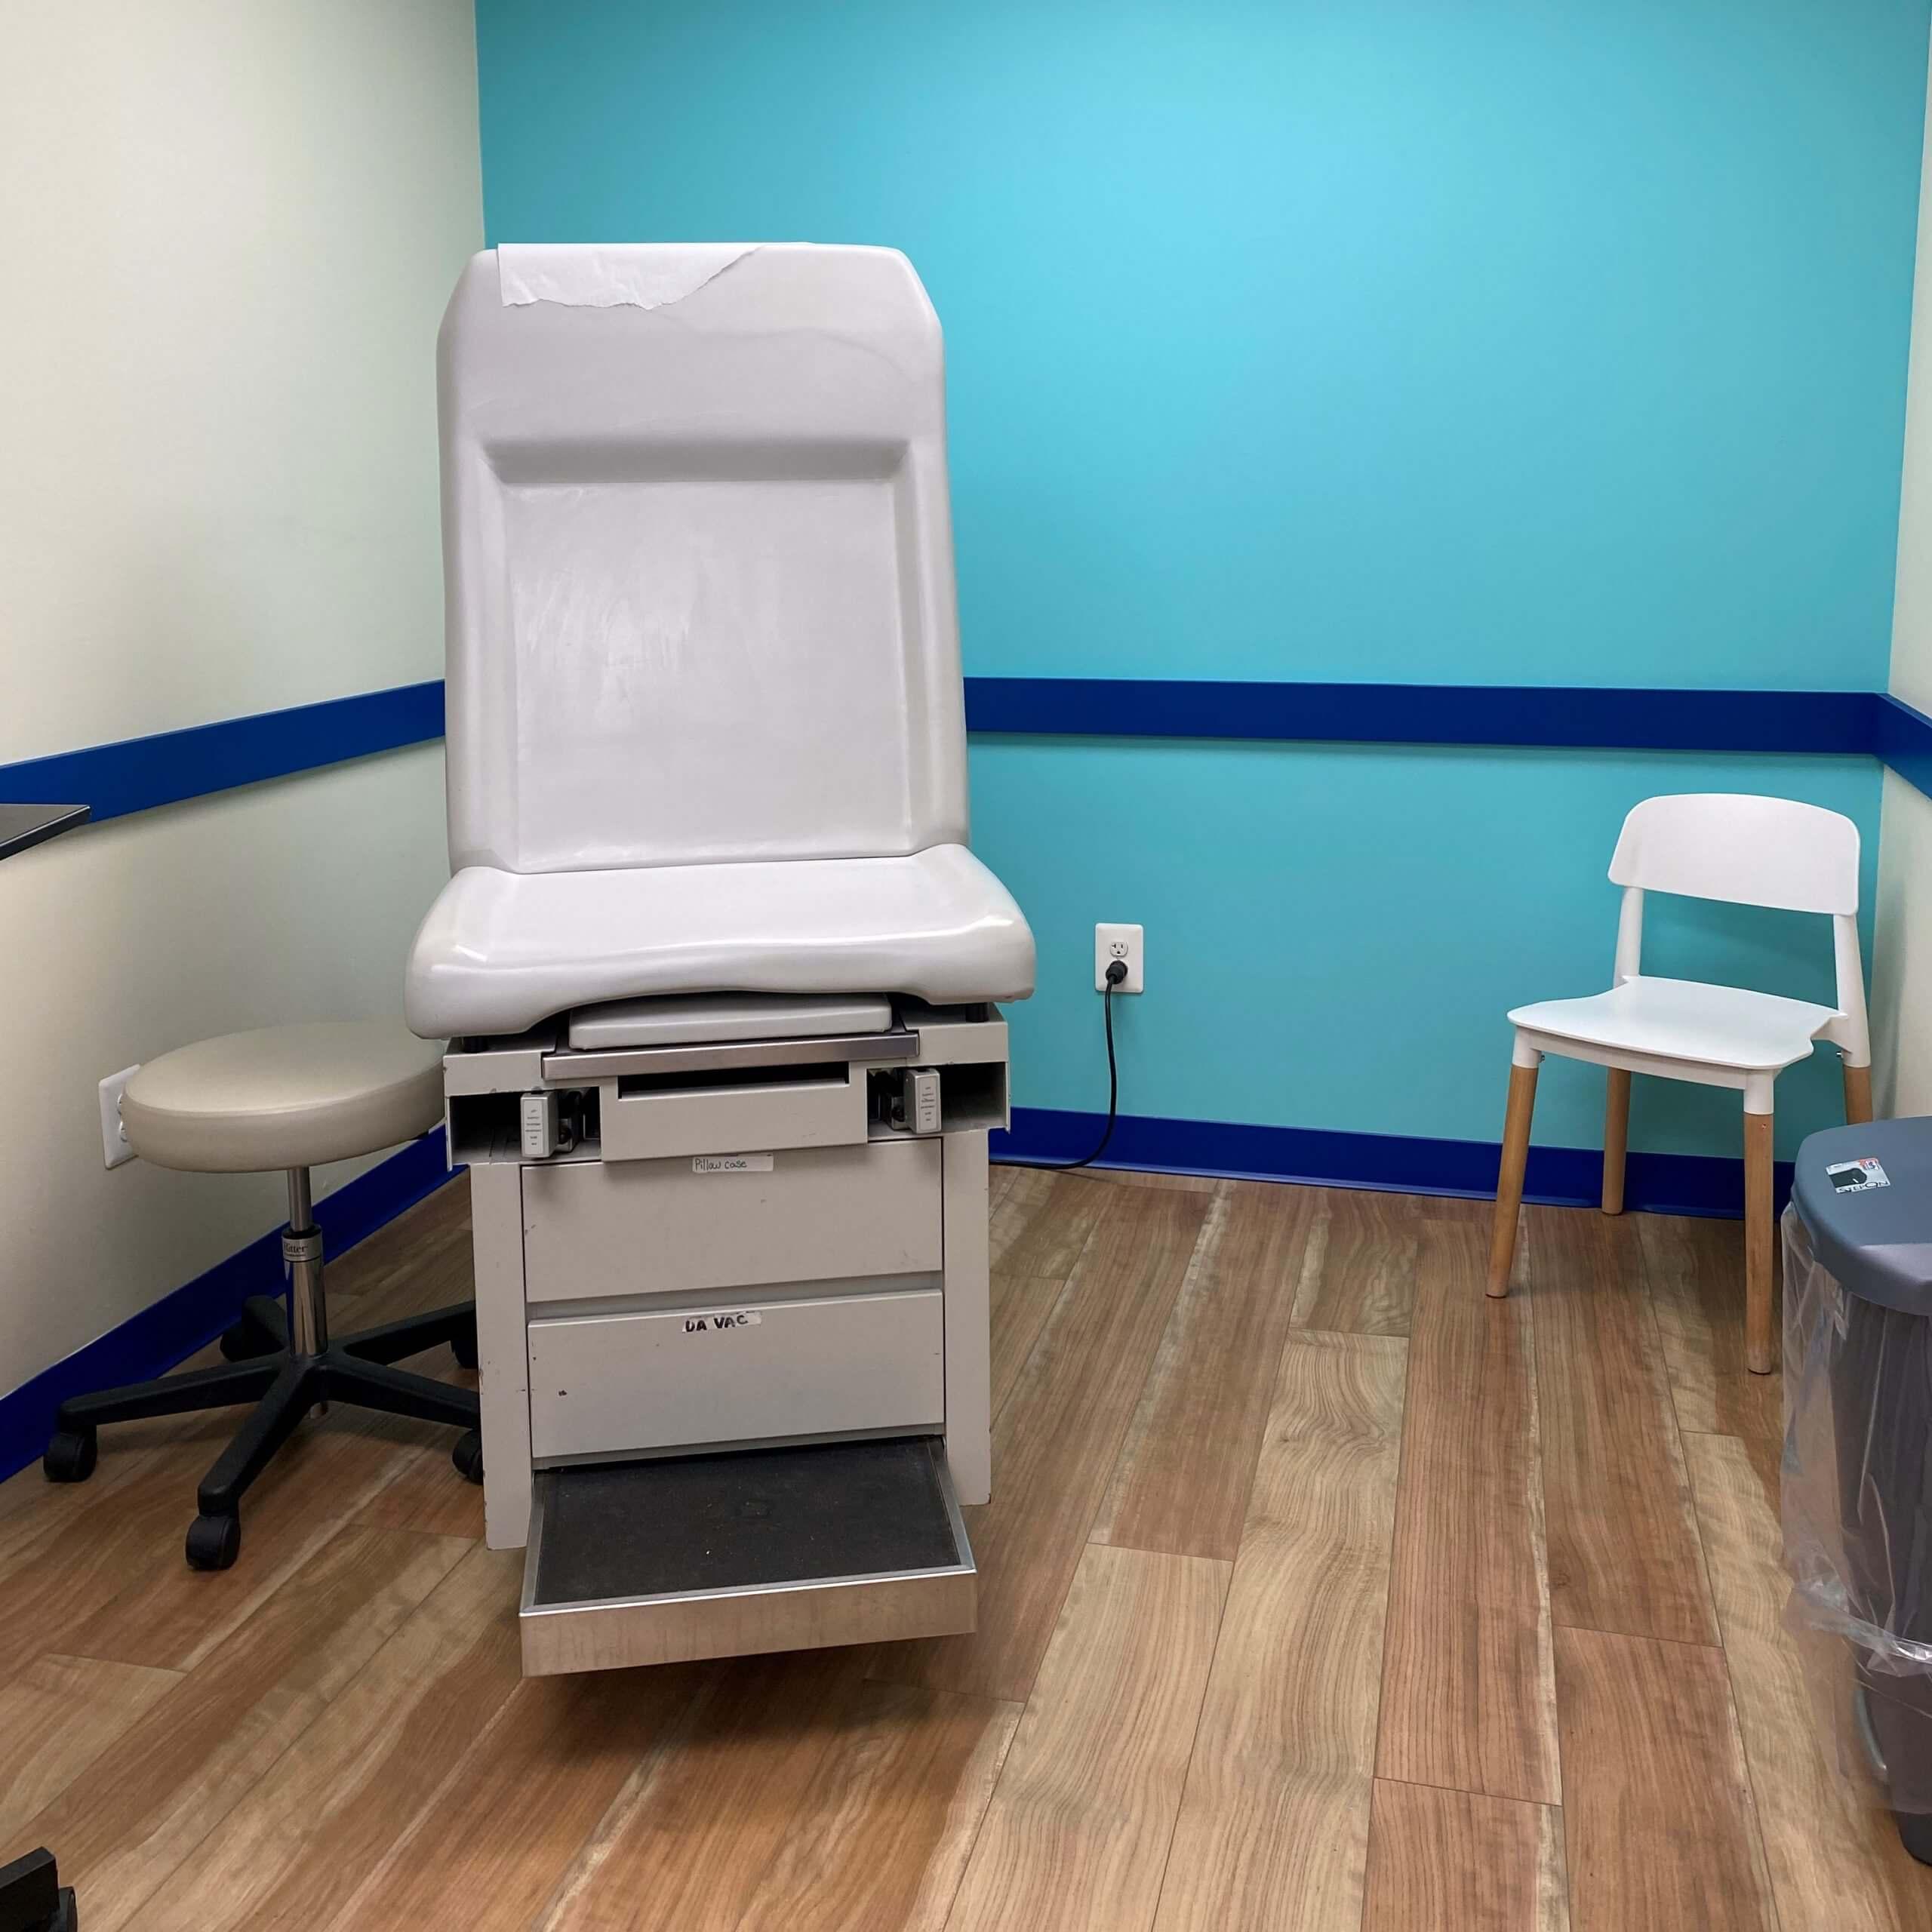 Clinic Exam Room 3